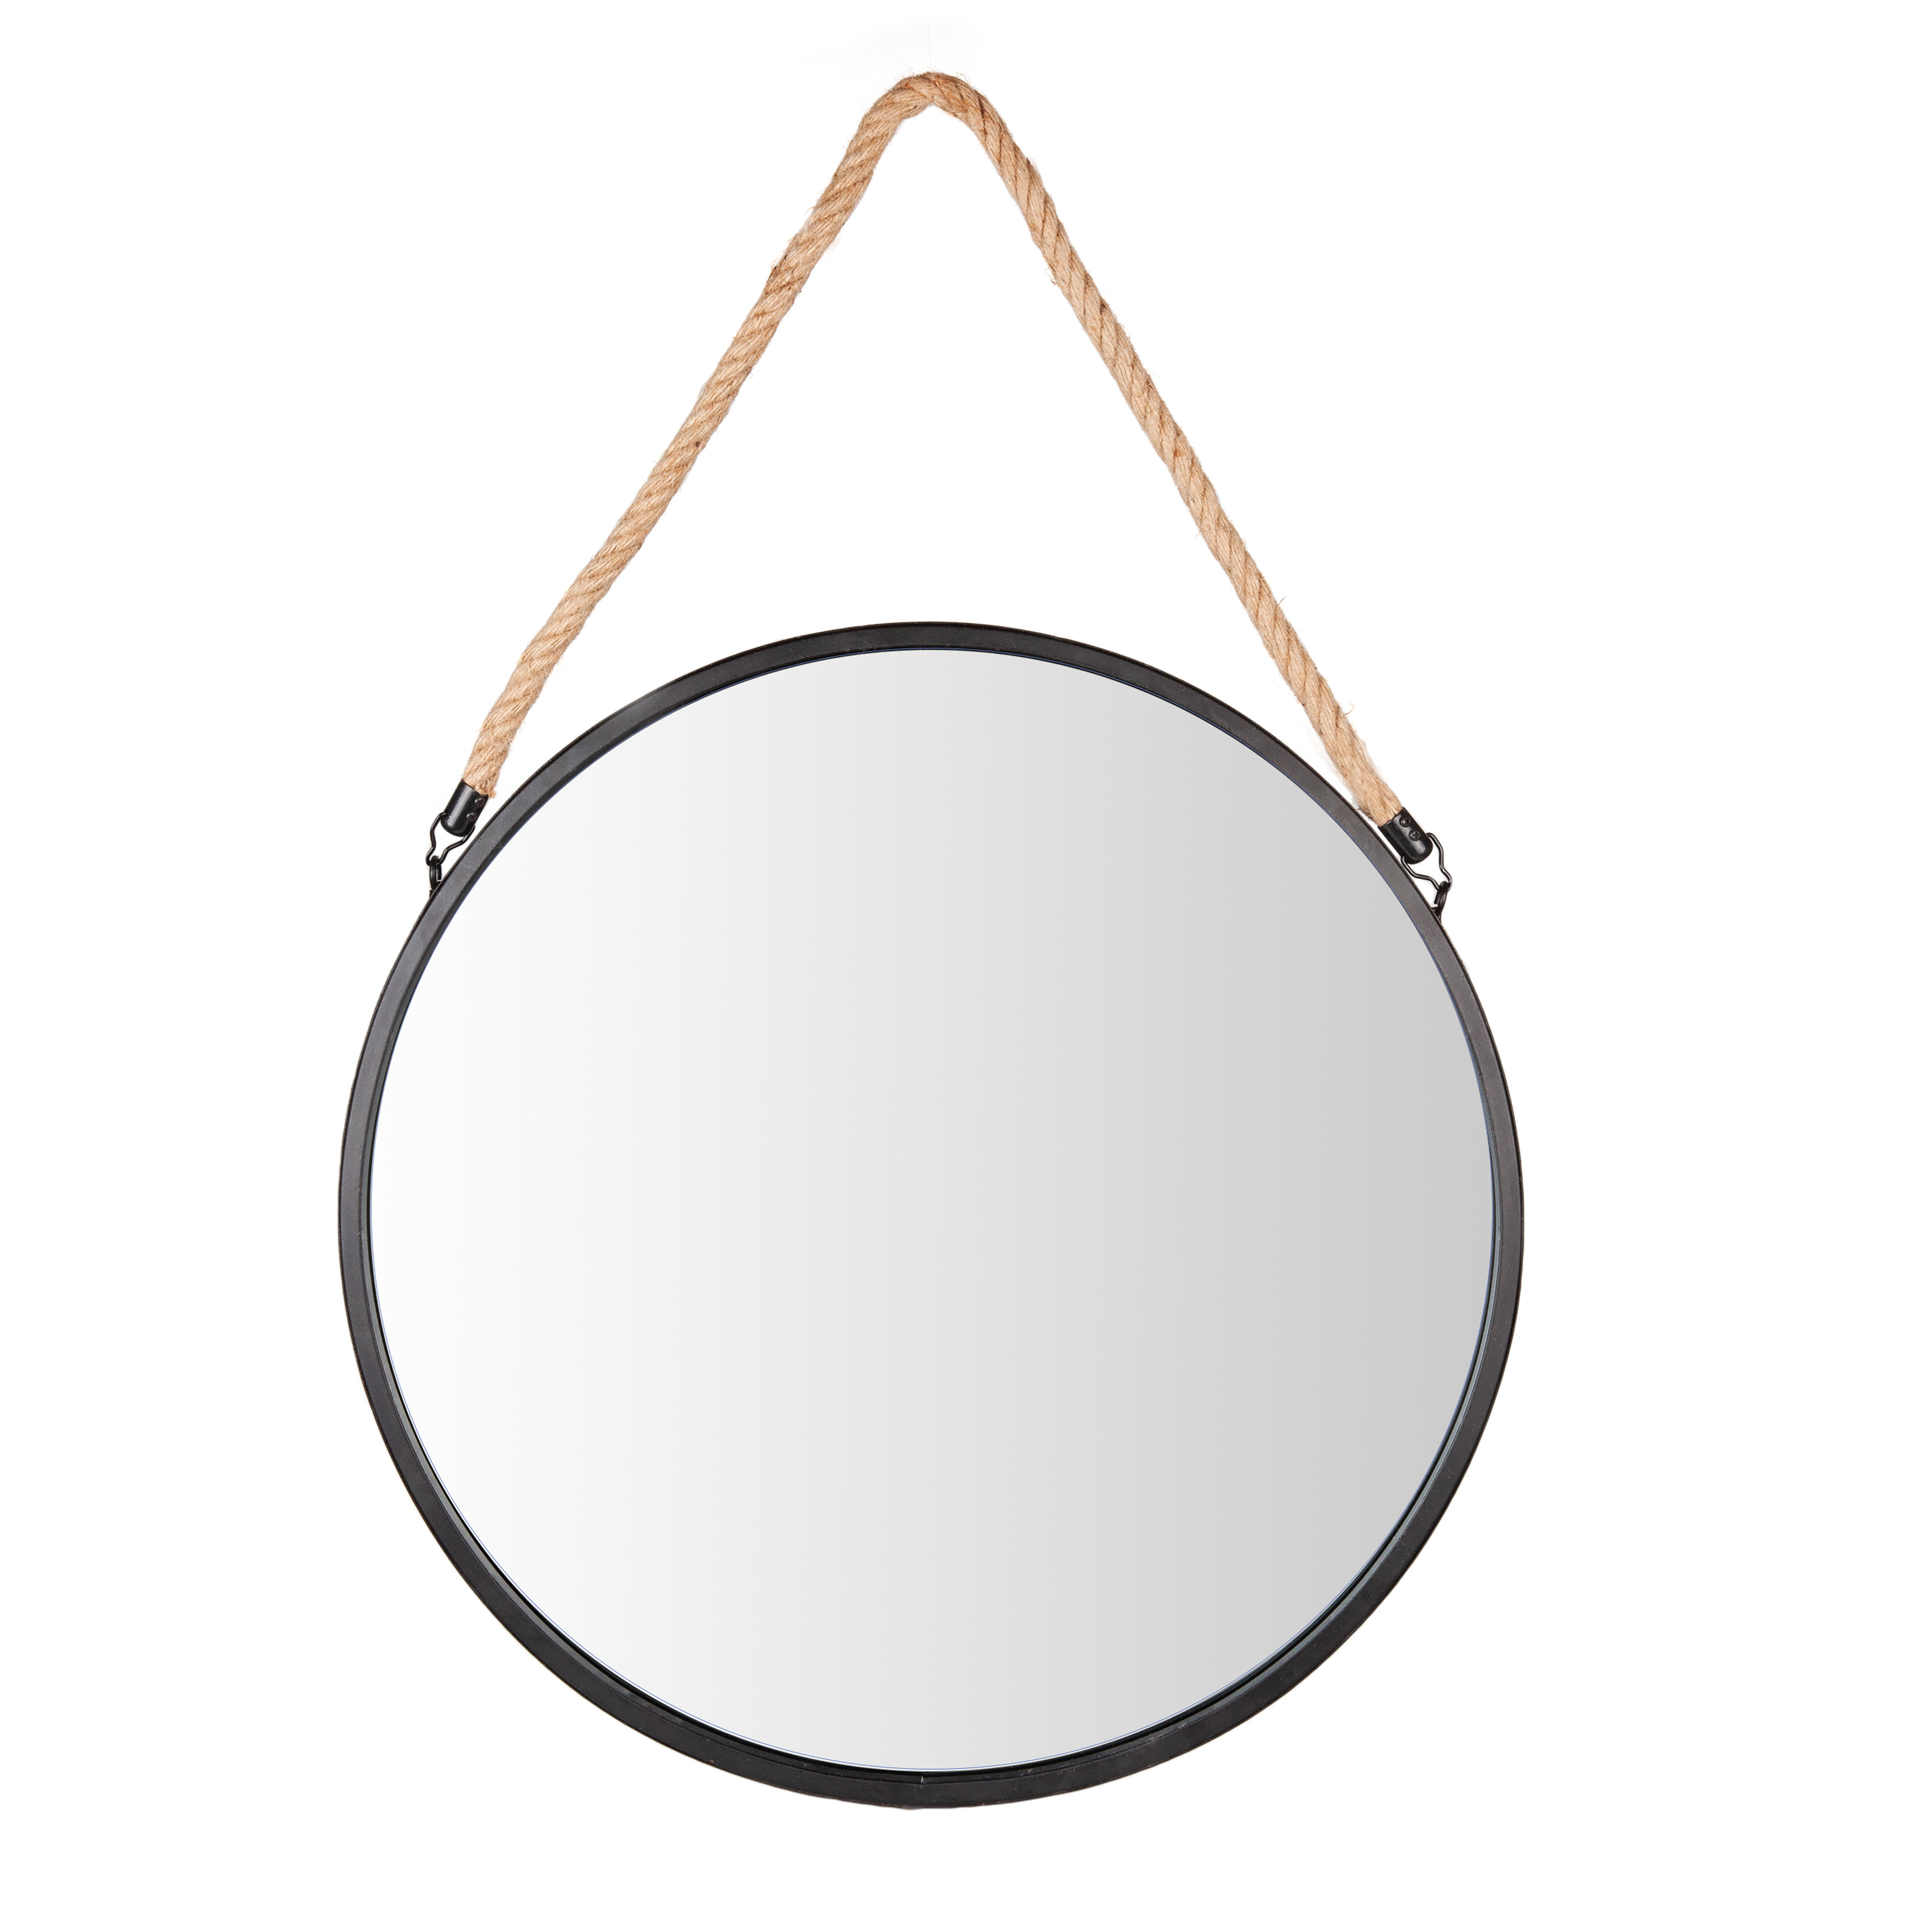 Rumfelt Decorative Round Metal Wall Mirror With Regard To Newest Decorative Round Wall Mirrors (View 18 of 20)